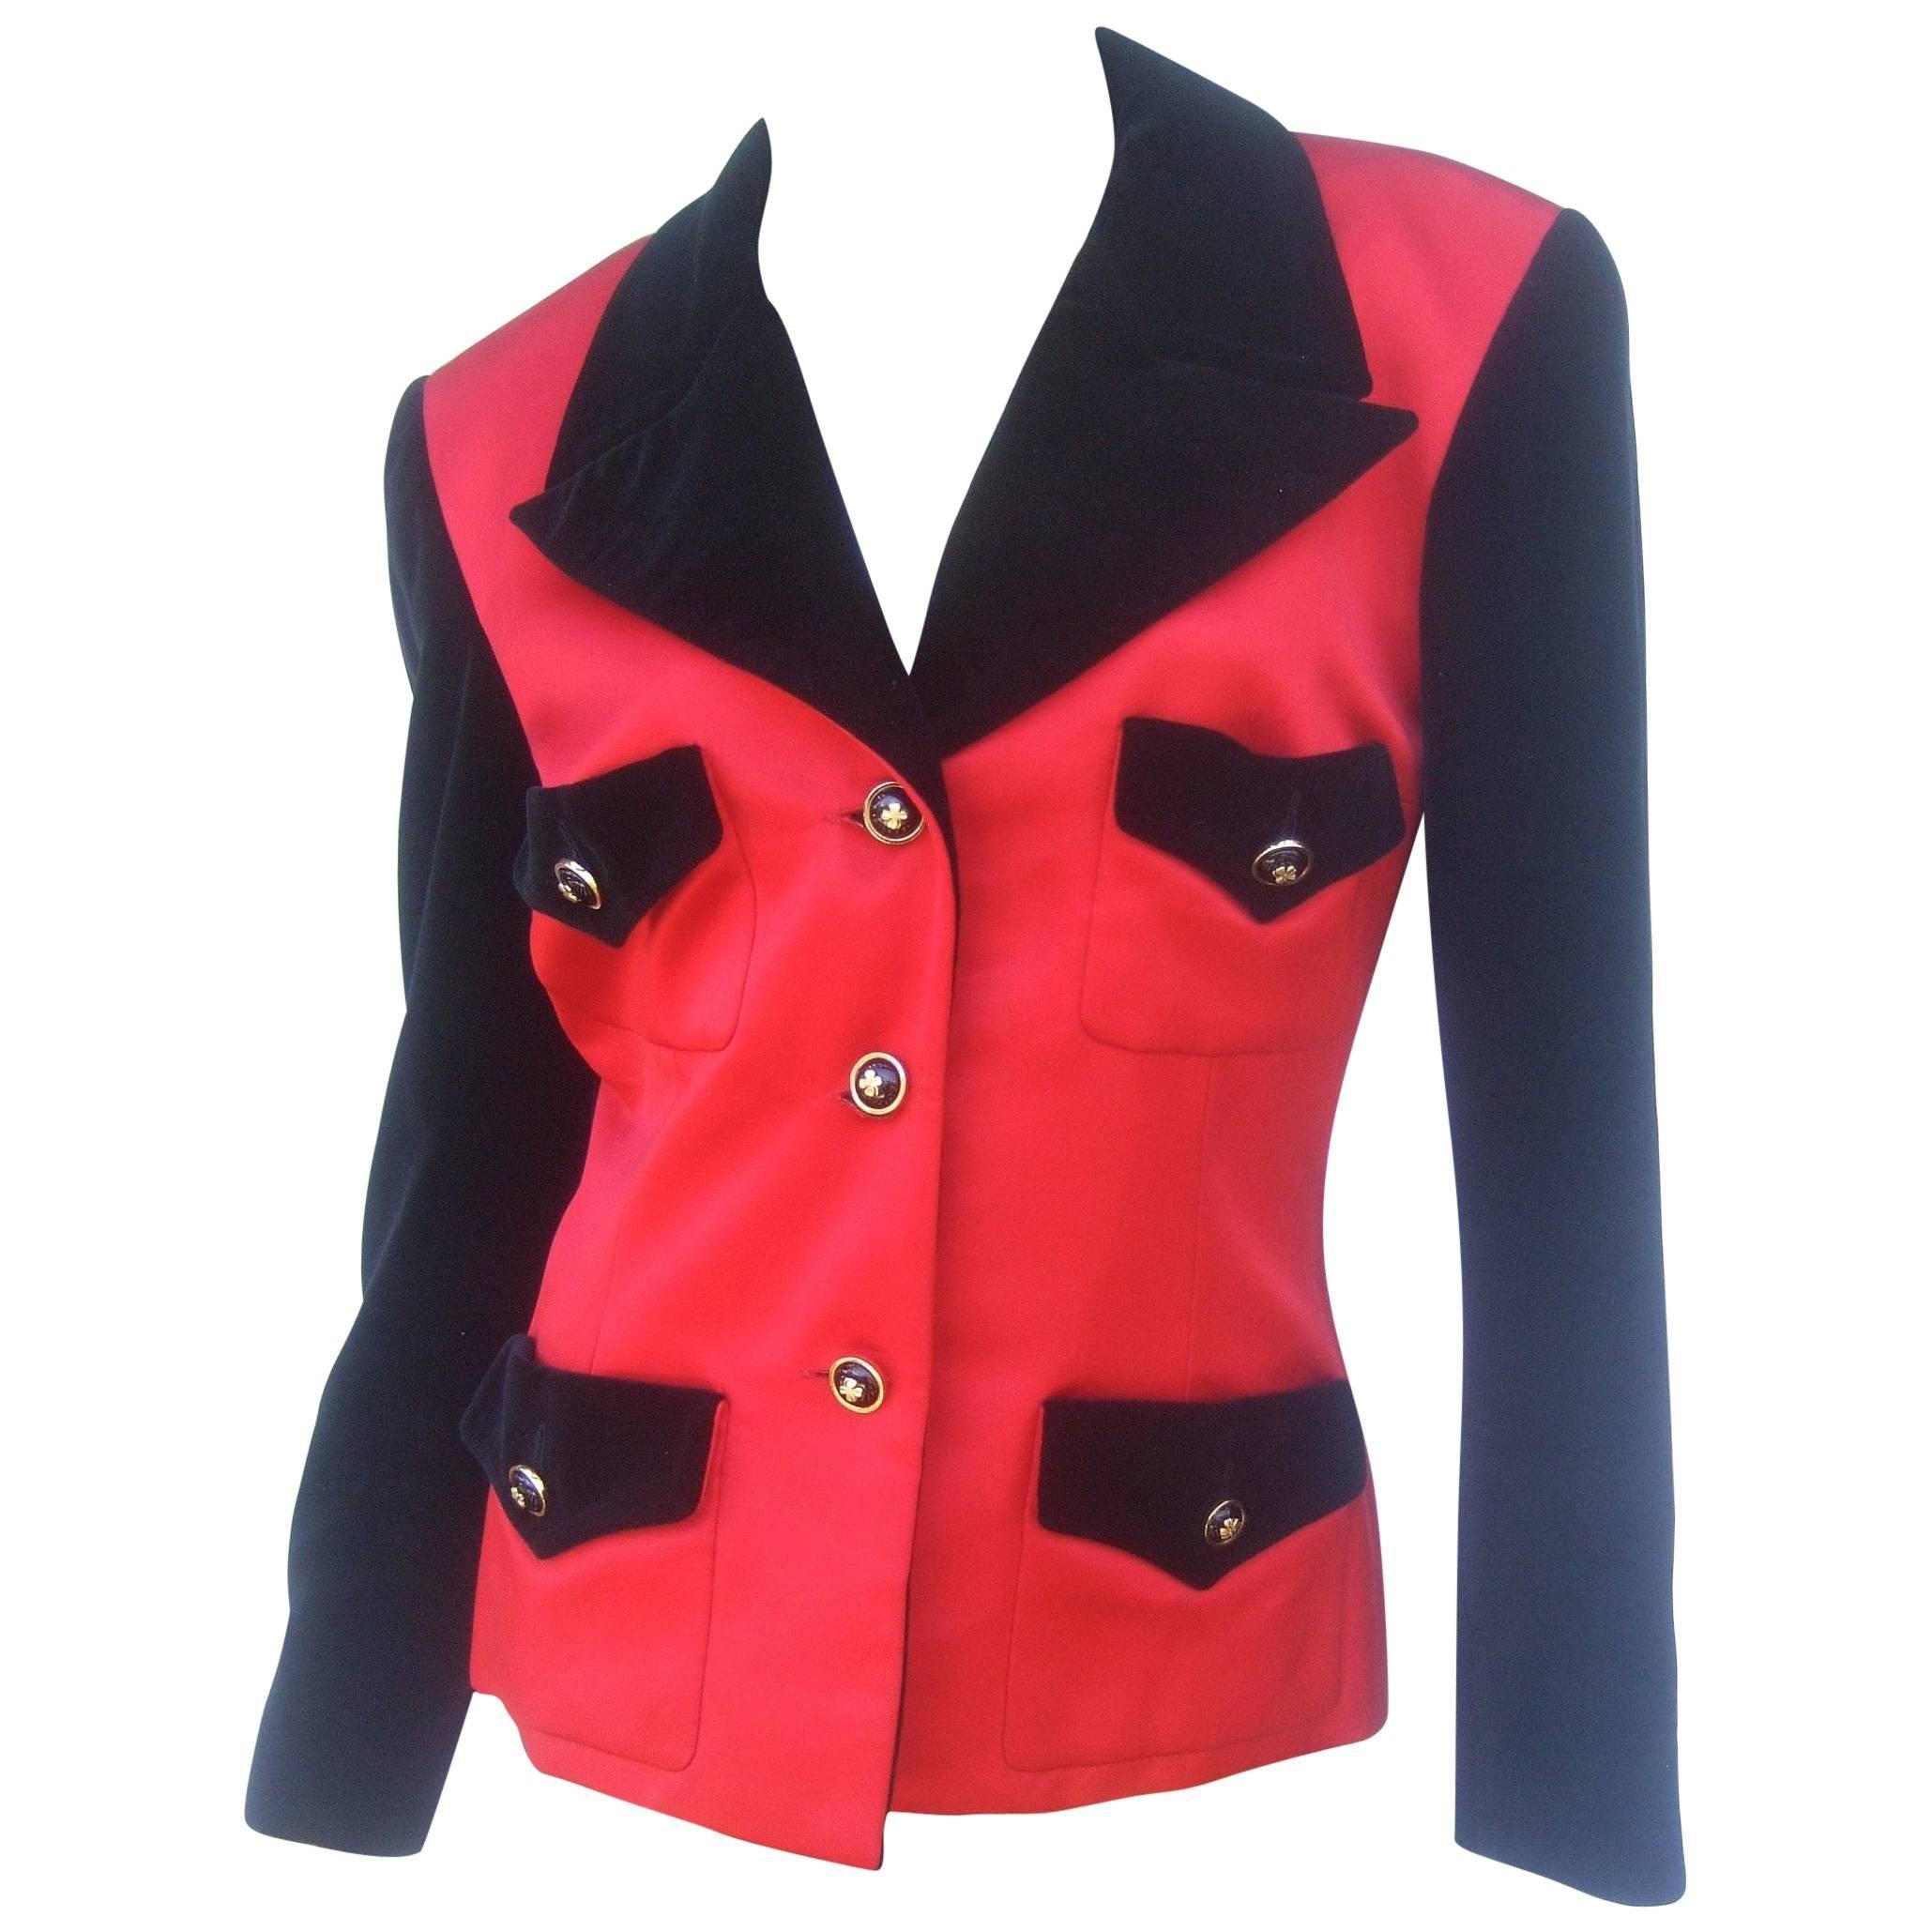 Chanel Boutique Scarlet Silk Black Velvet Evening Jacket, circa 1990s